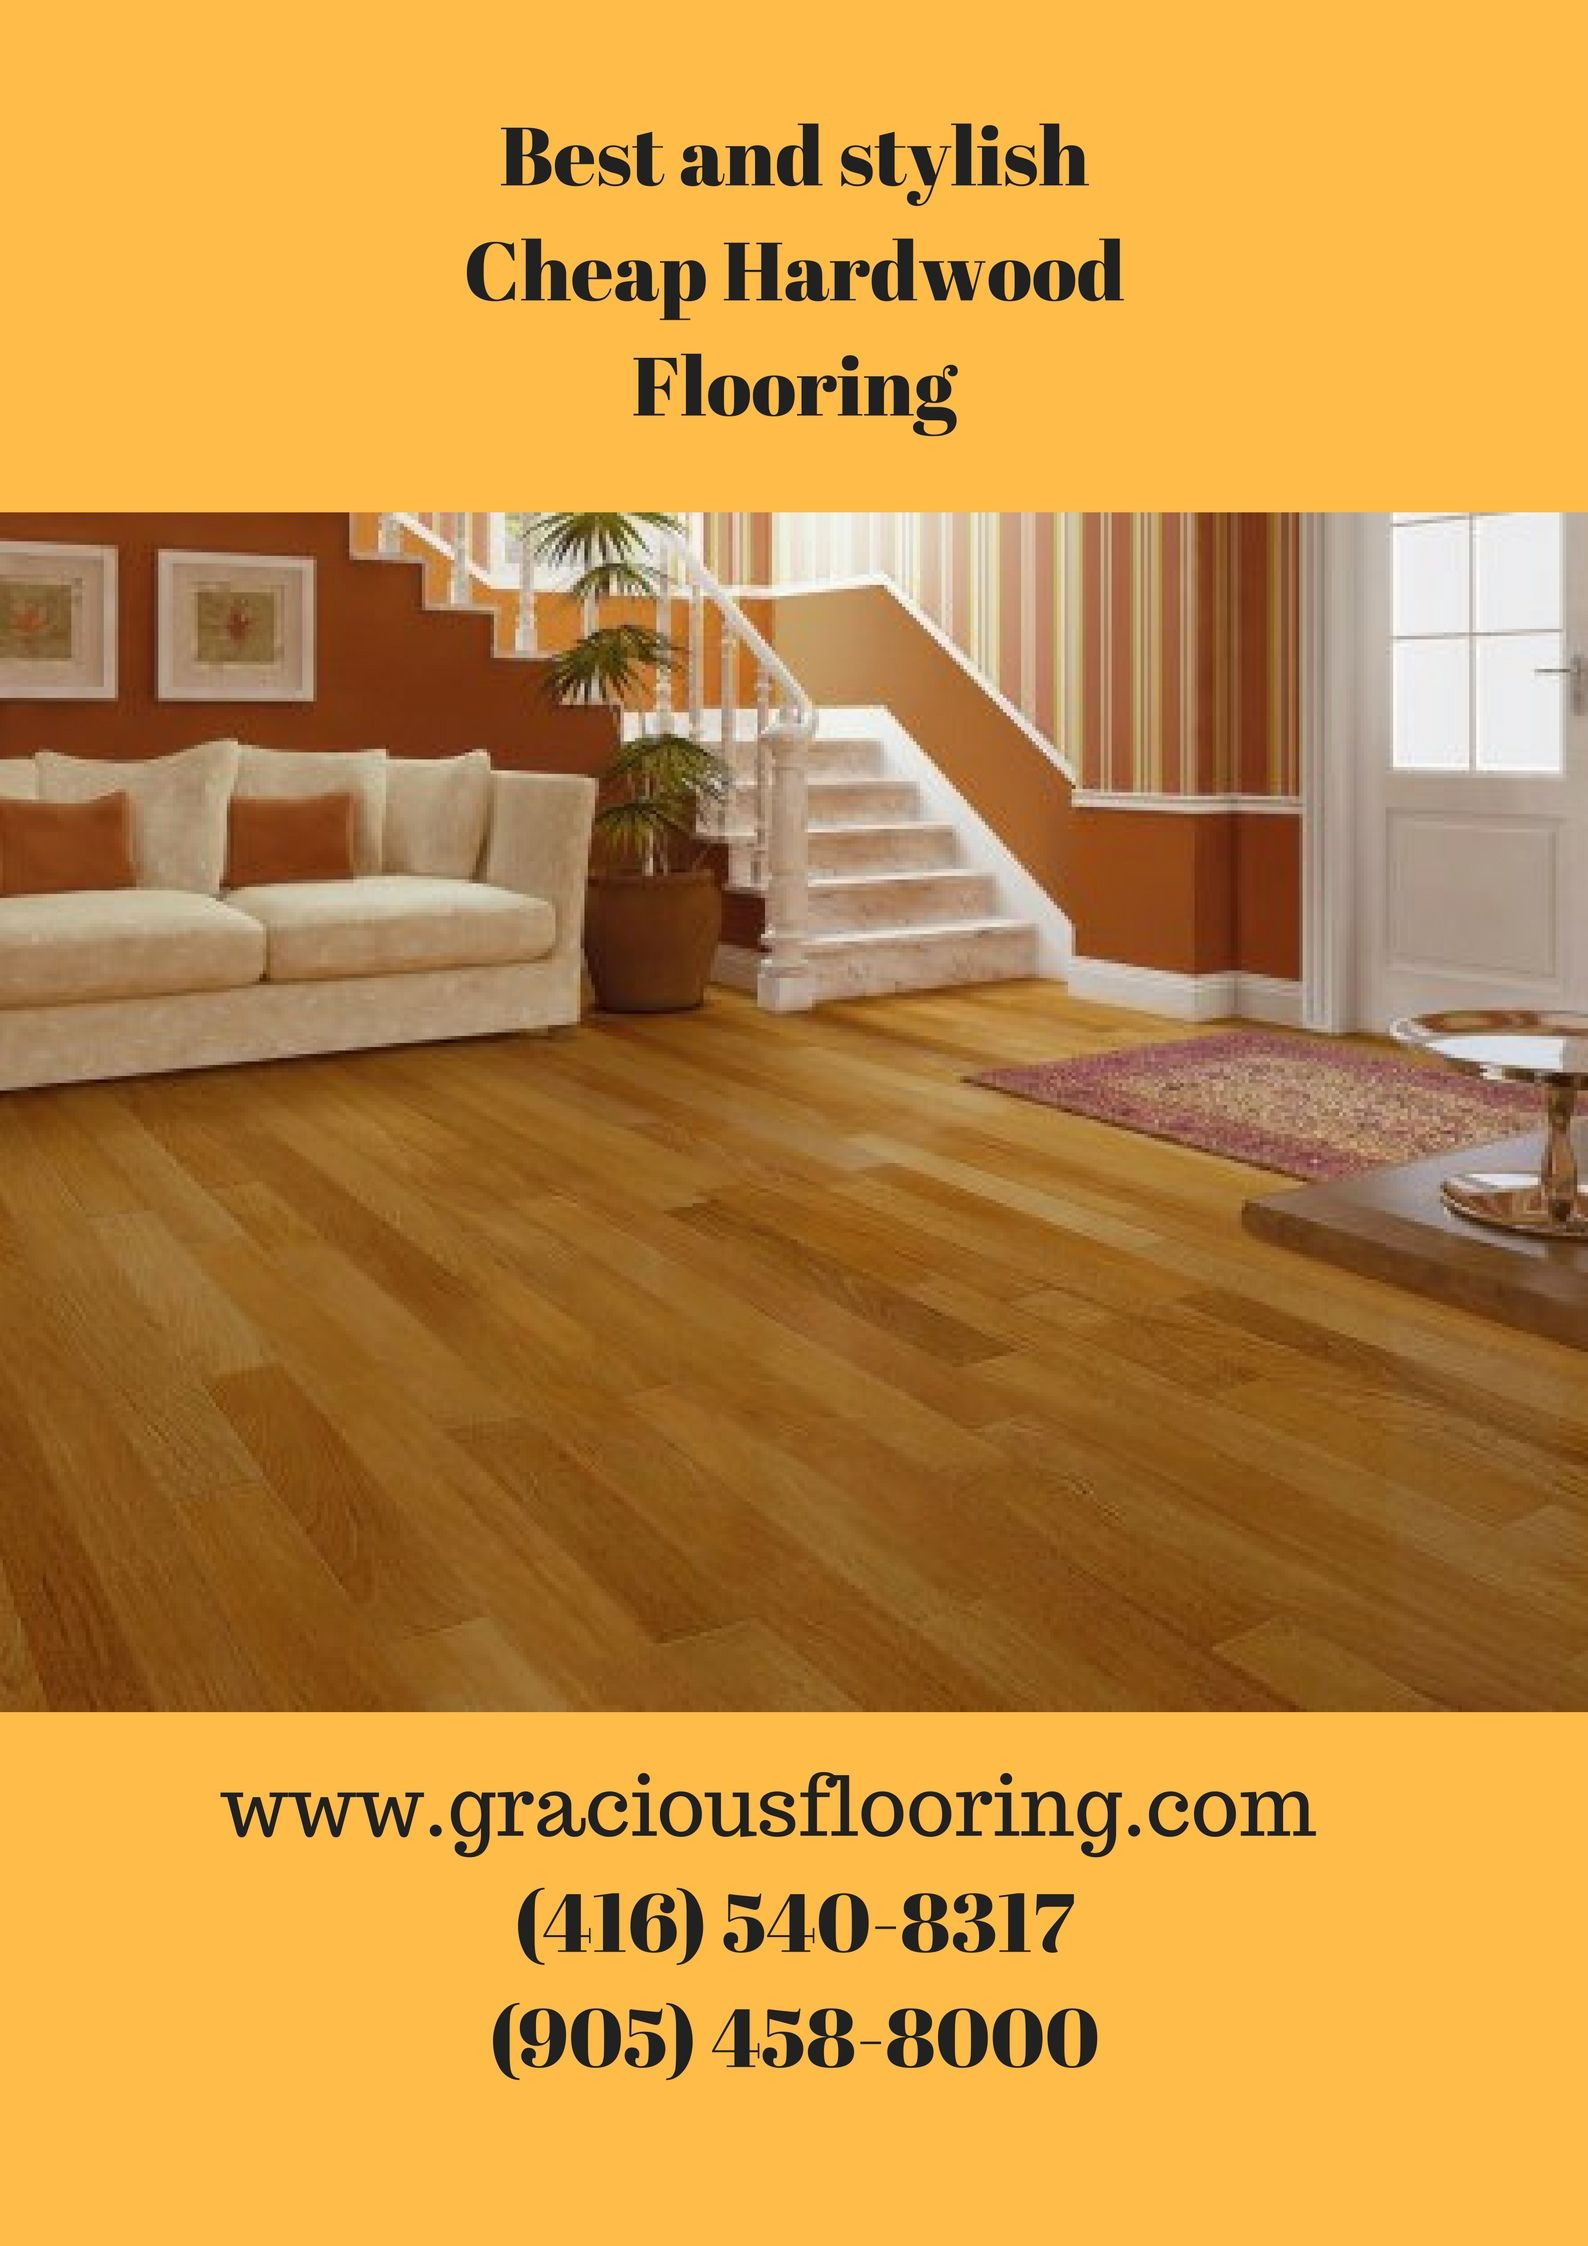 hardwood floor restoration toronto of for cheap hardwood flooring at unbelievable rate contact with regard to brampton hardwood flooring store brampton toronto mississauga